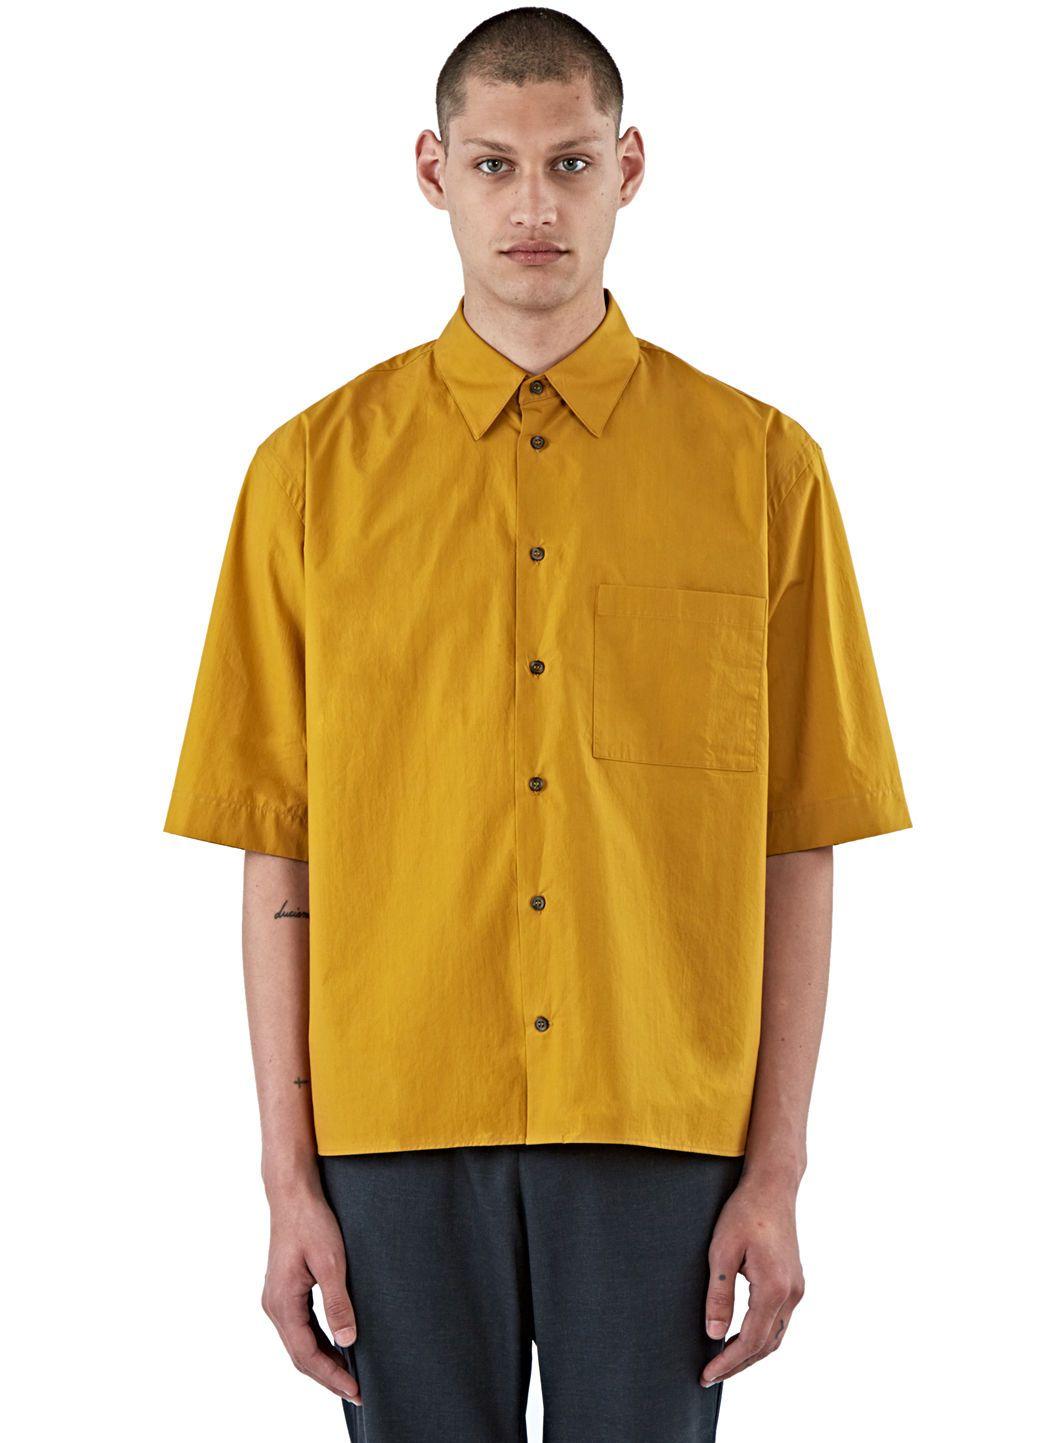 Mustard yellow dress shirts for men